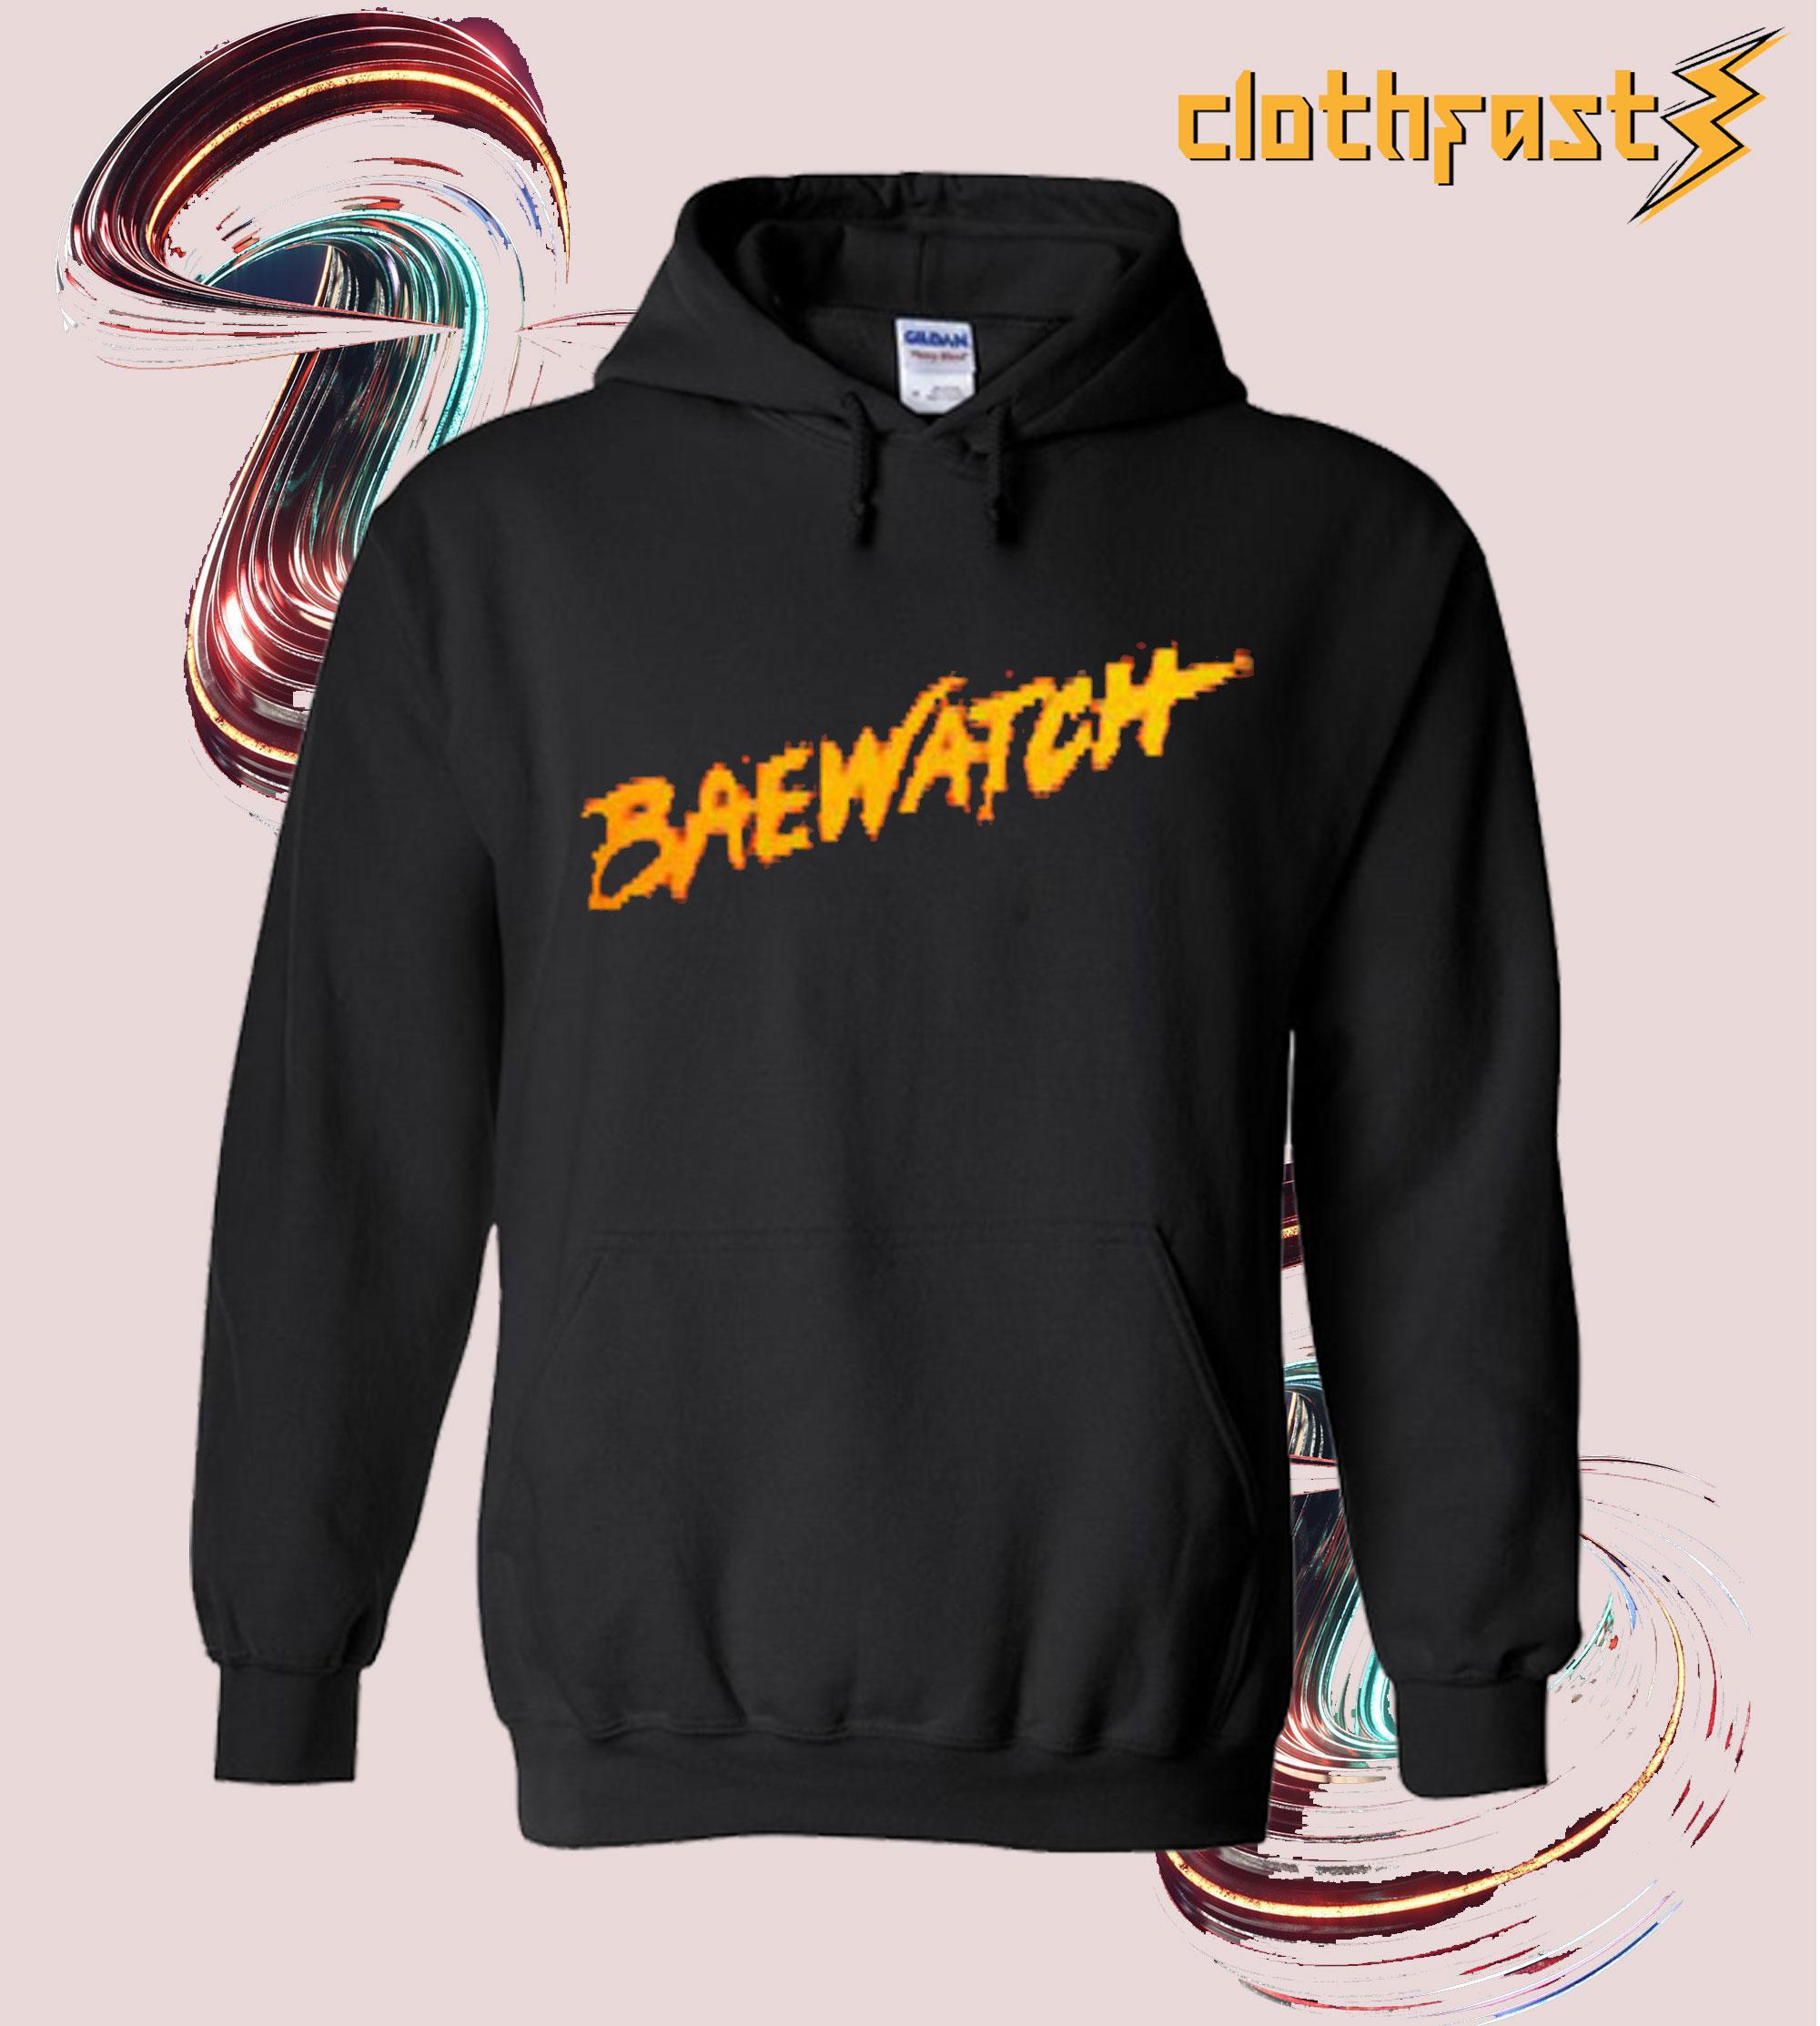 Baewatch Red Hoodie